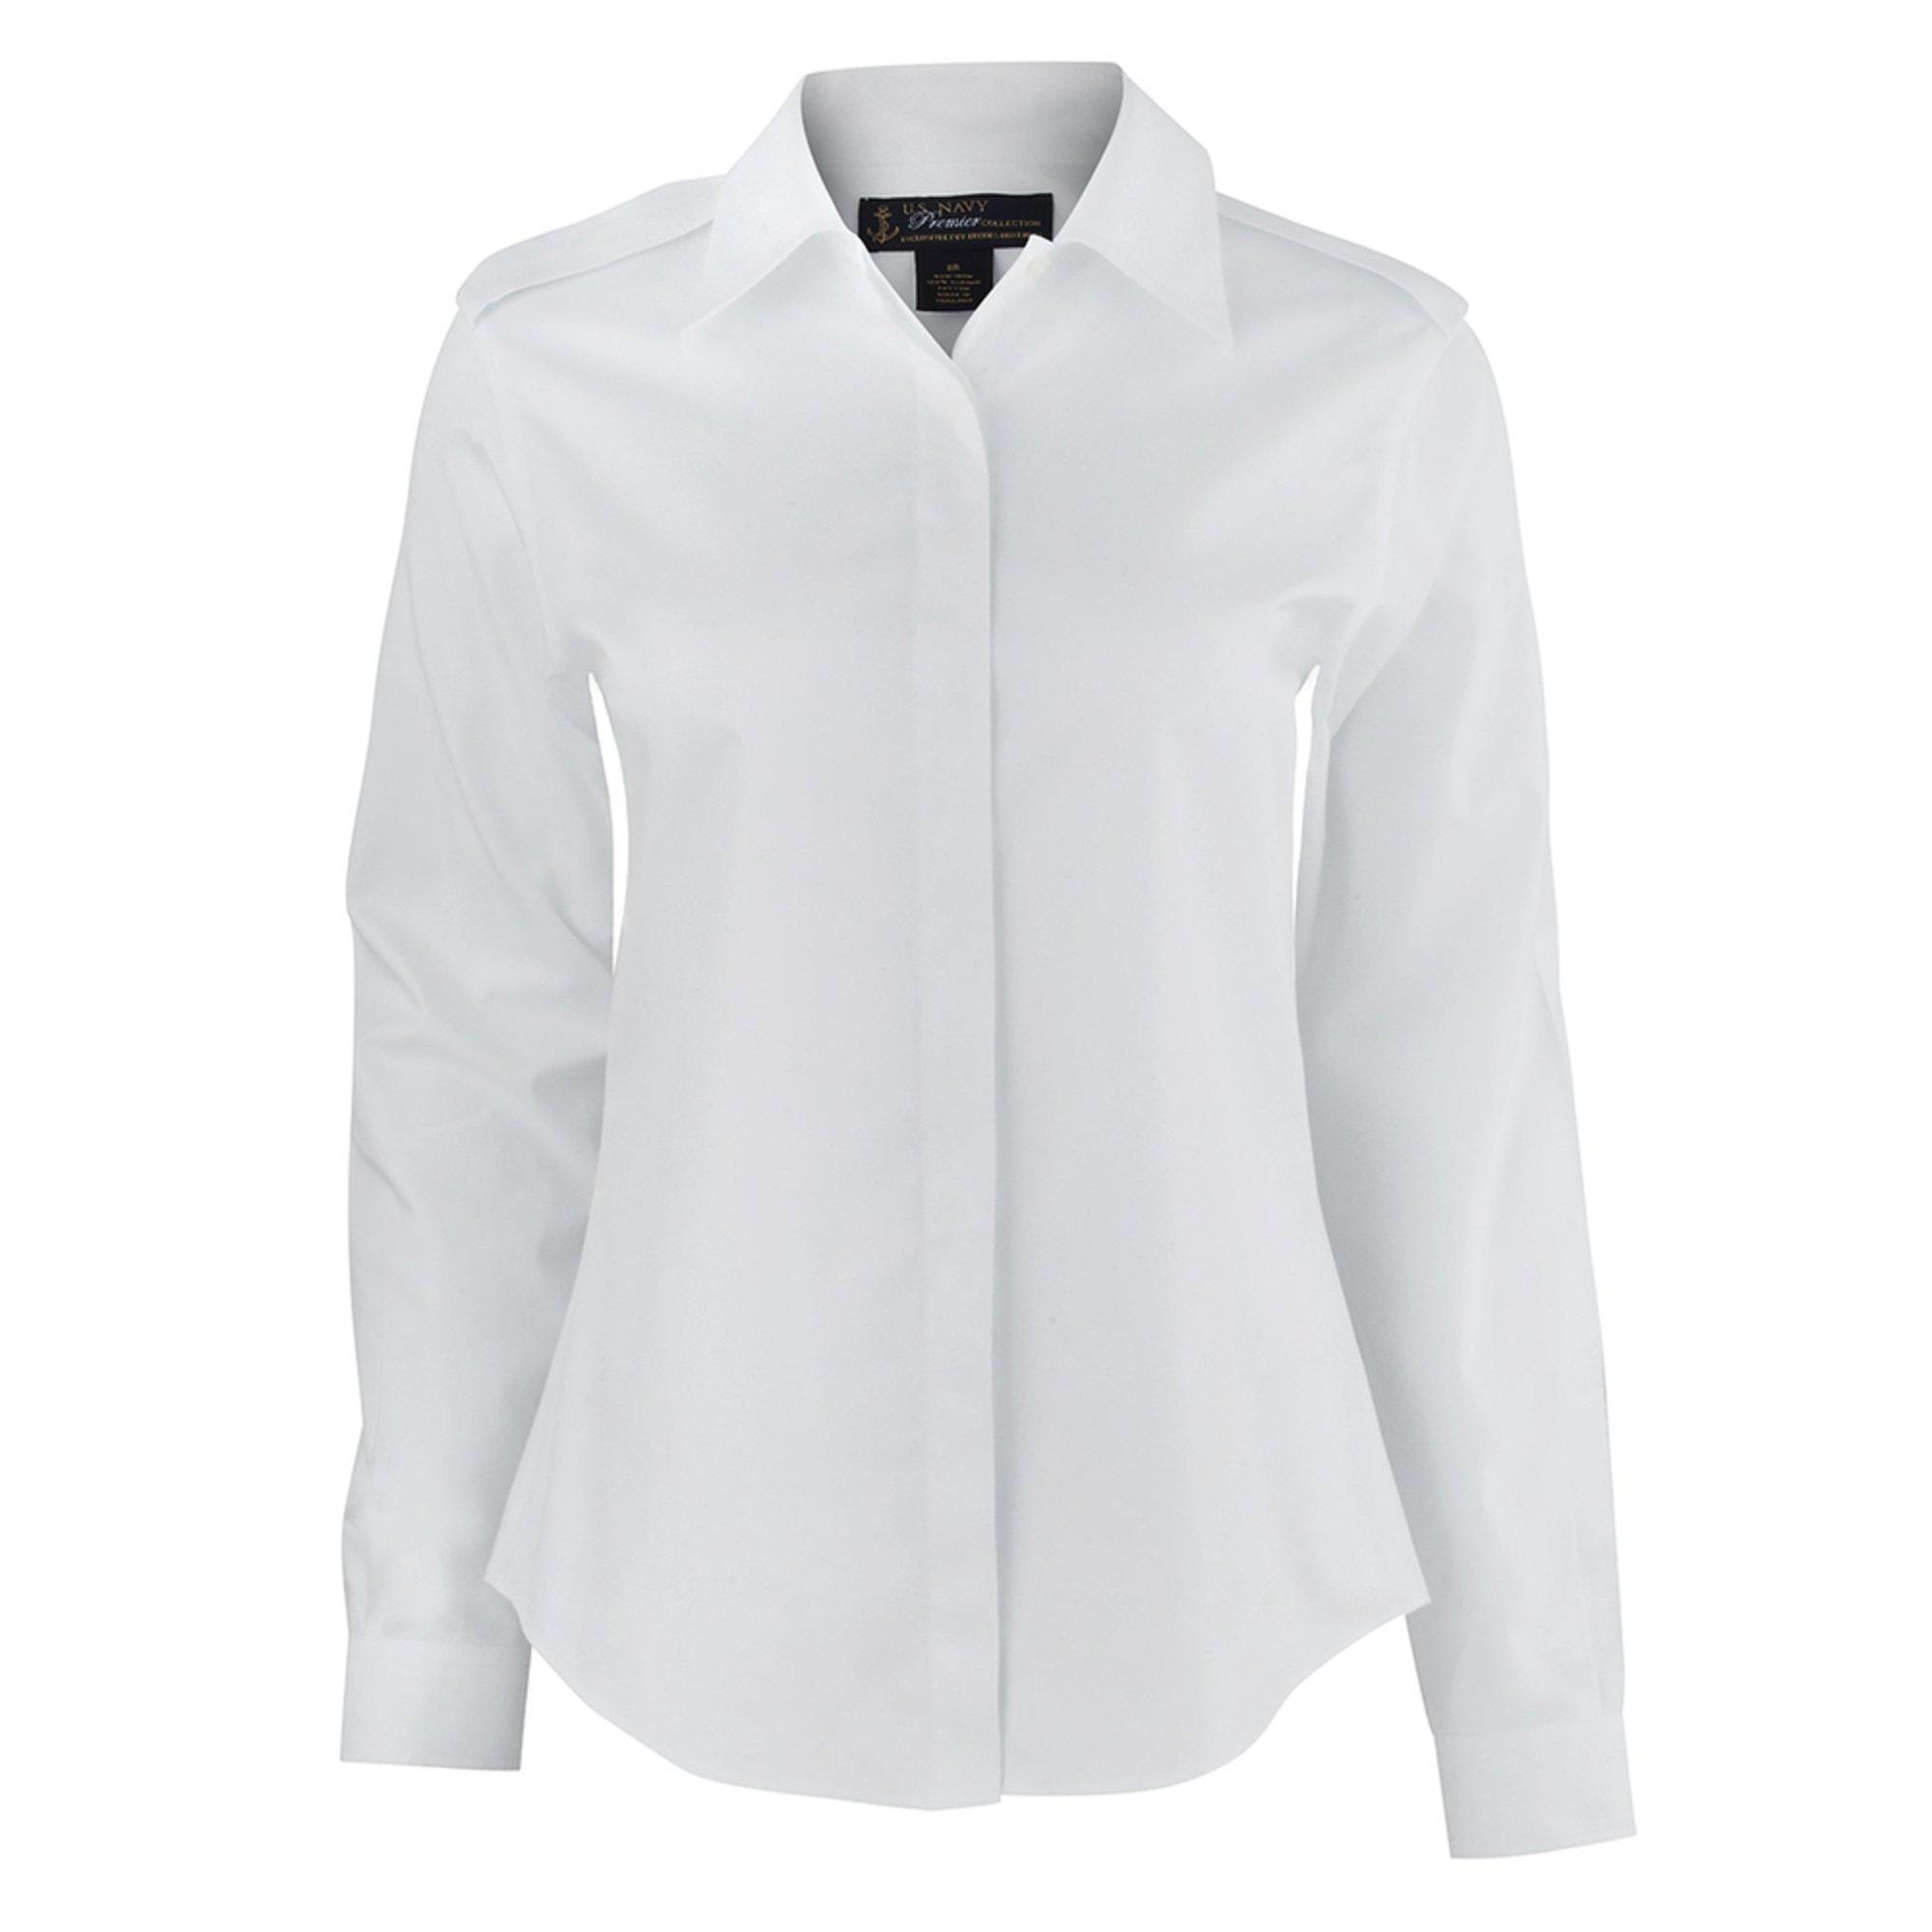 61941166e88e5 Brooks Brothers Women s No-iron White Dress Shirt